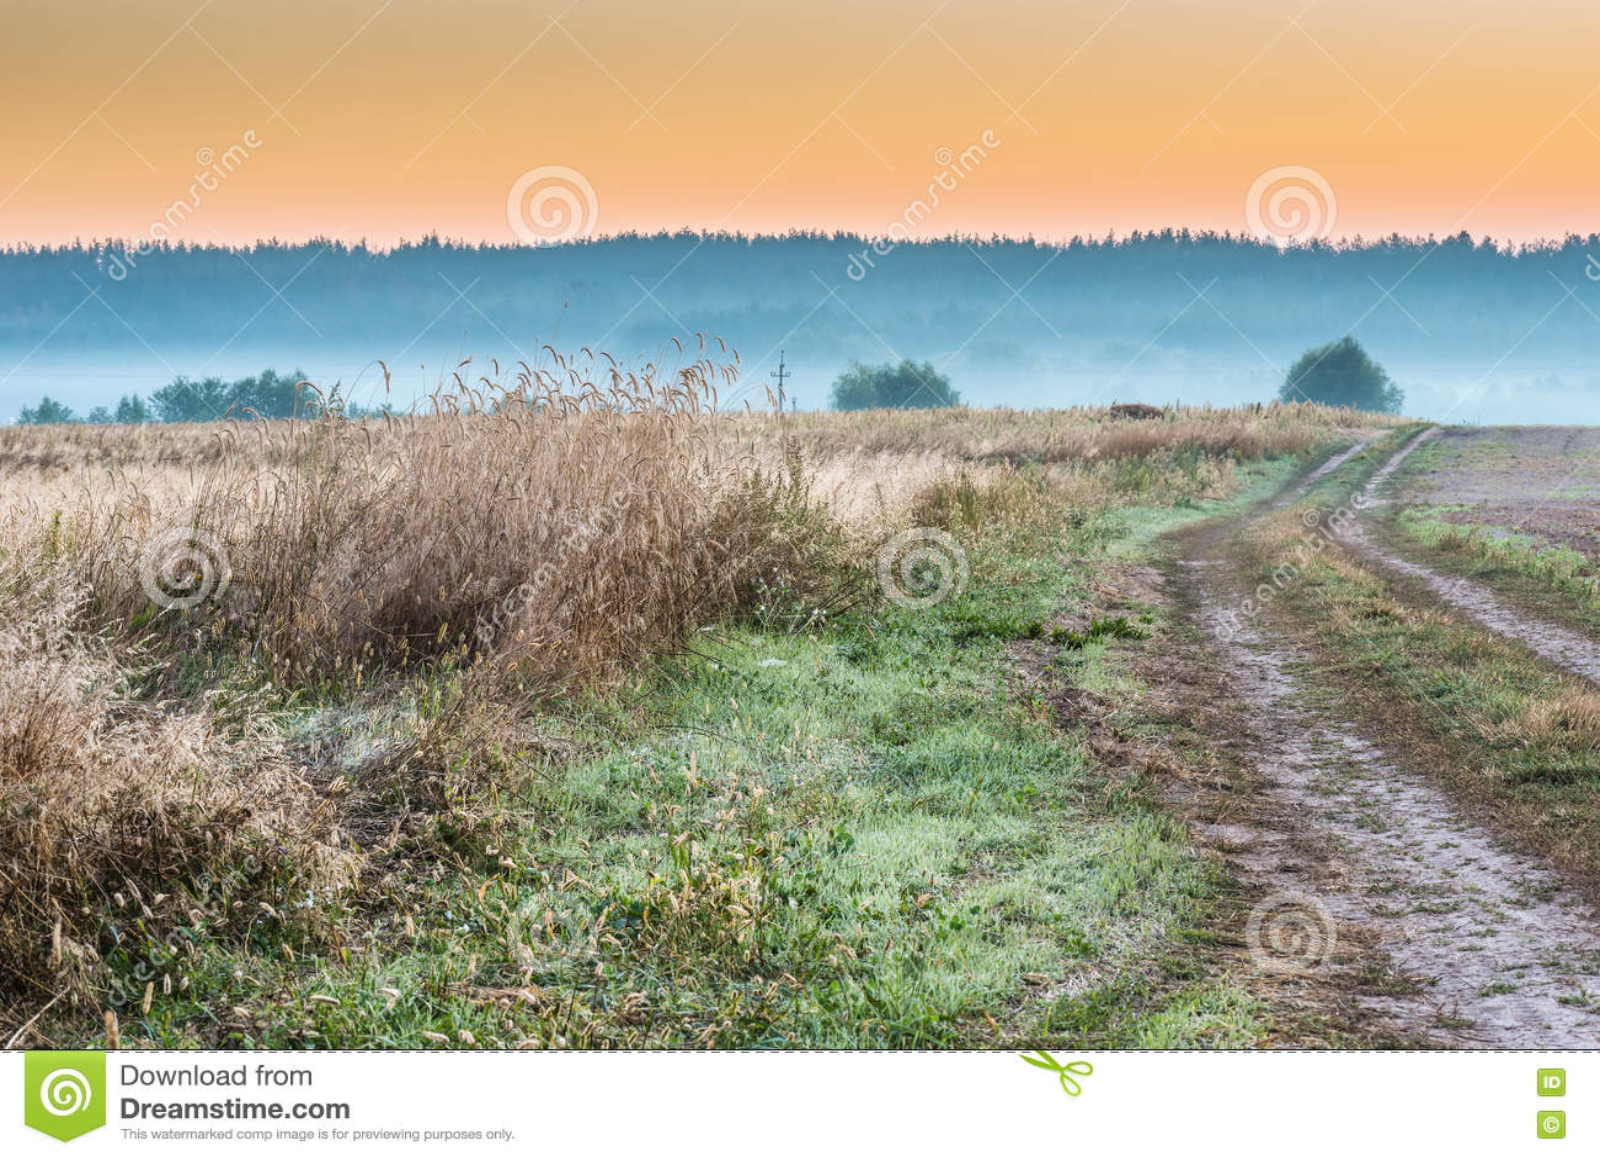 Foggy morning in a field.